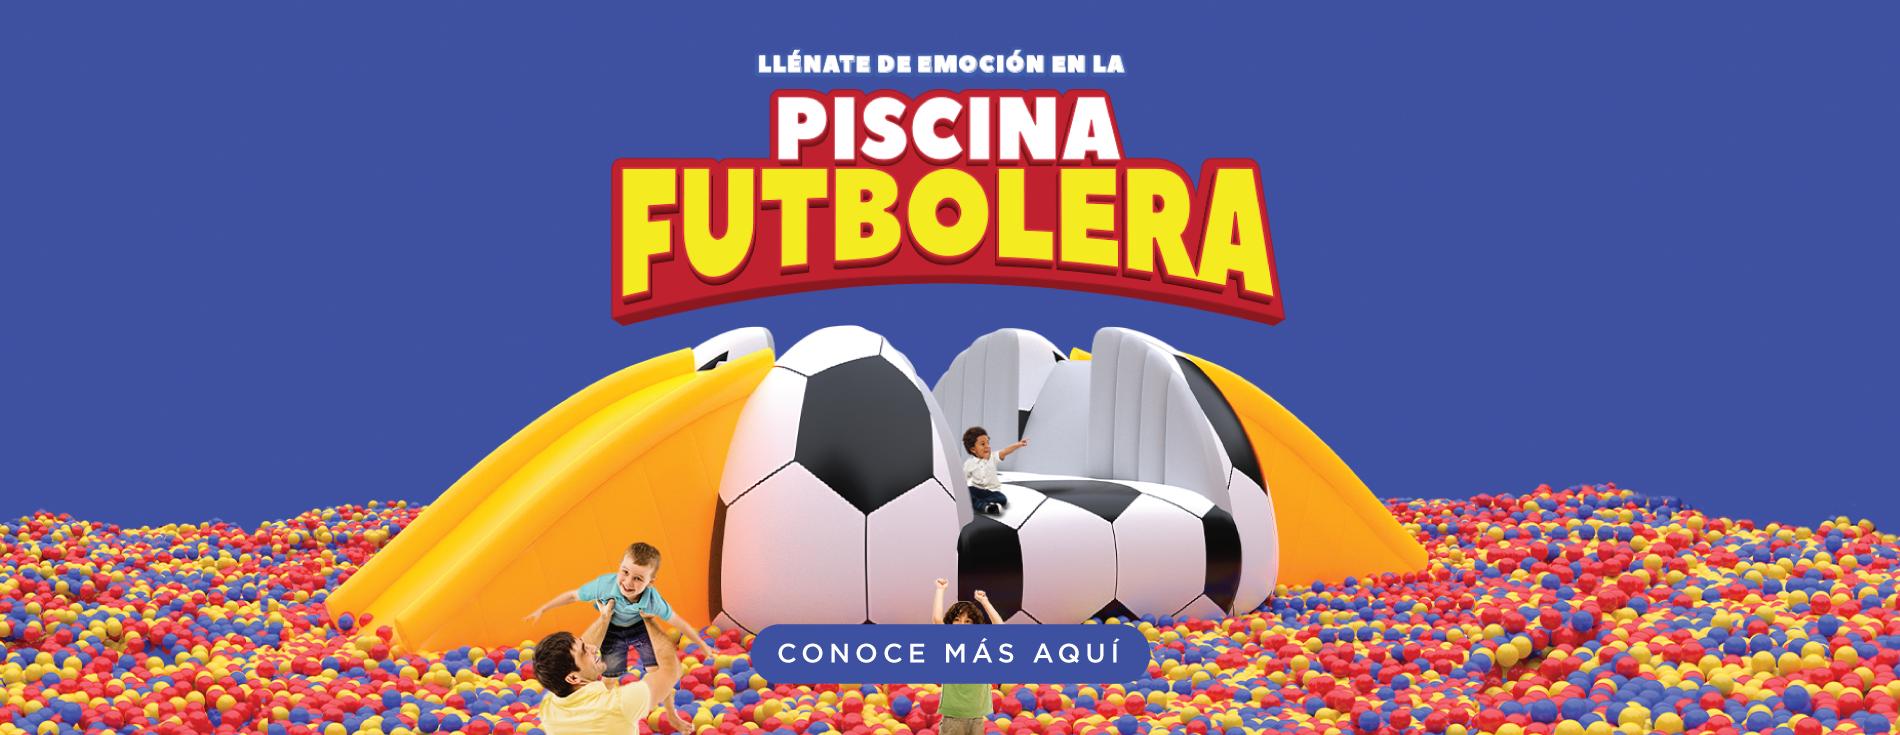 Piscina futbolera - Tunja